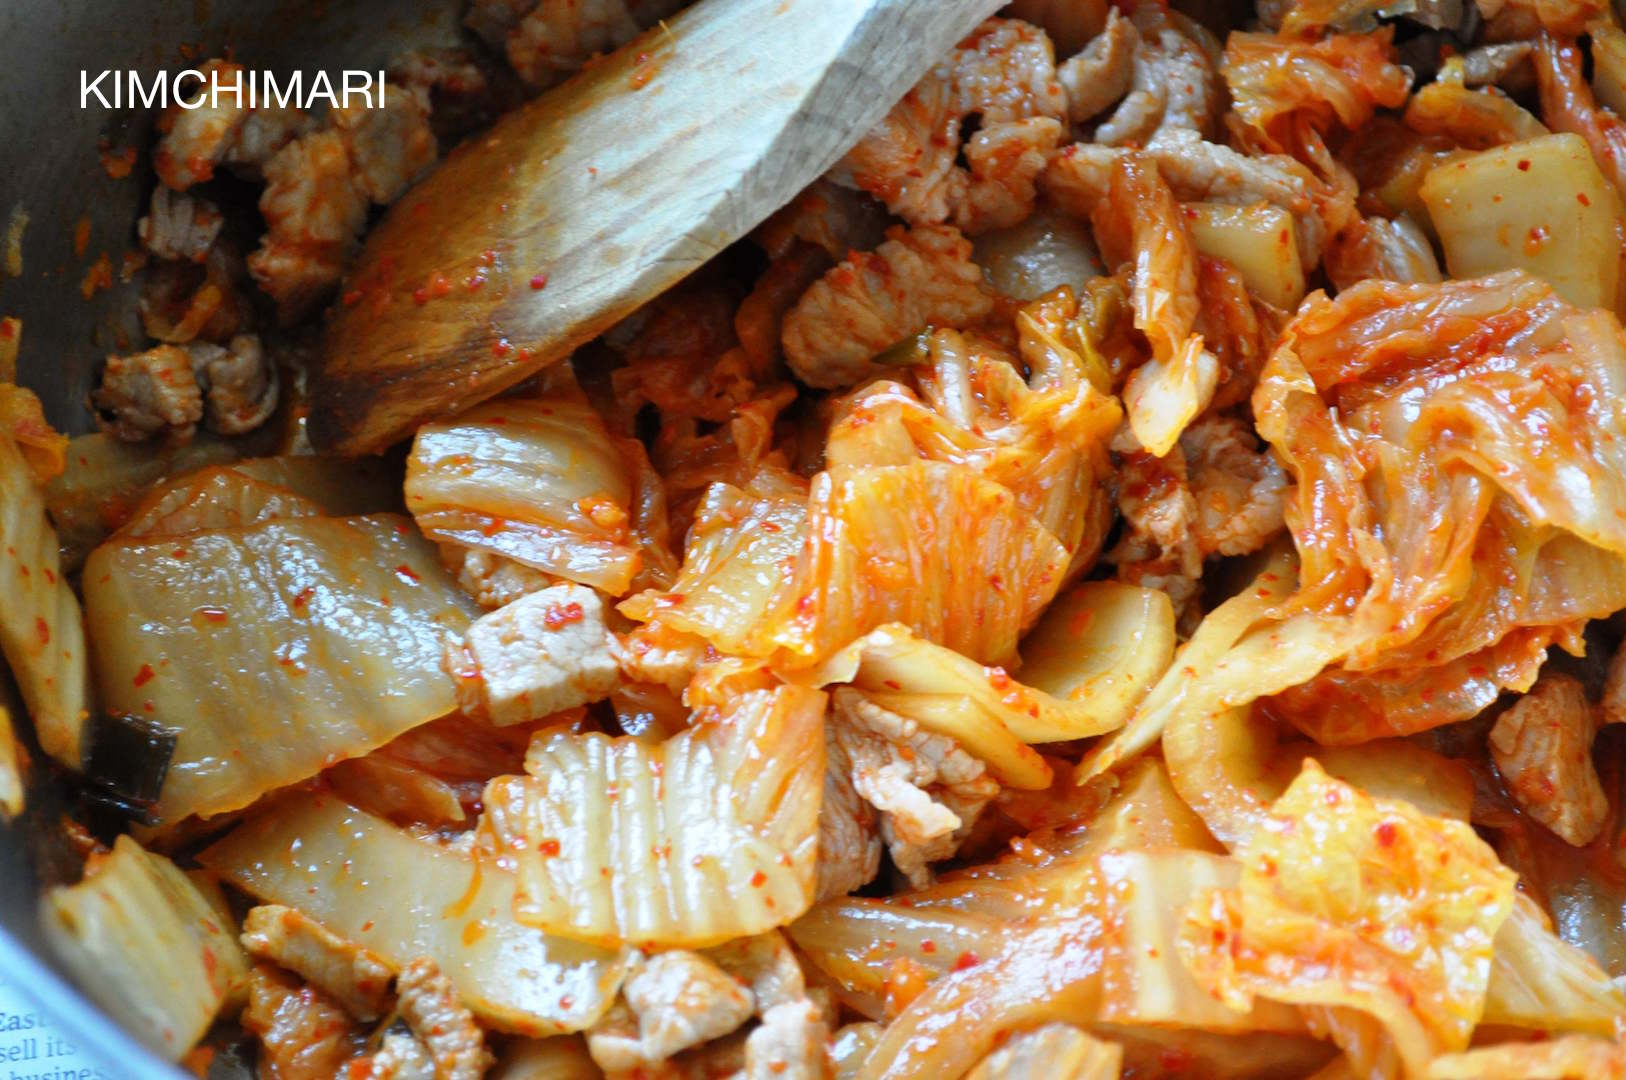 Kimchi stew (jjigae) with pork belly | Kimchimari